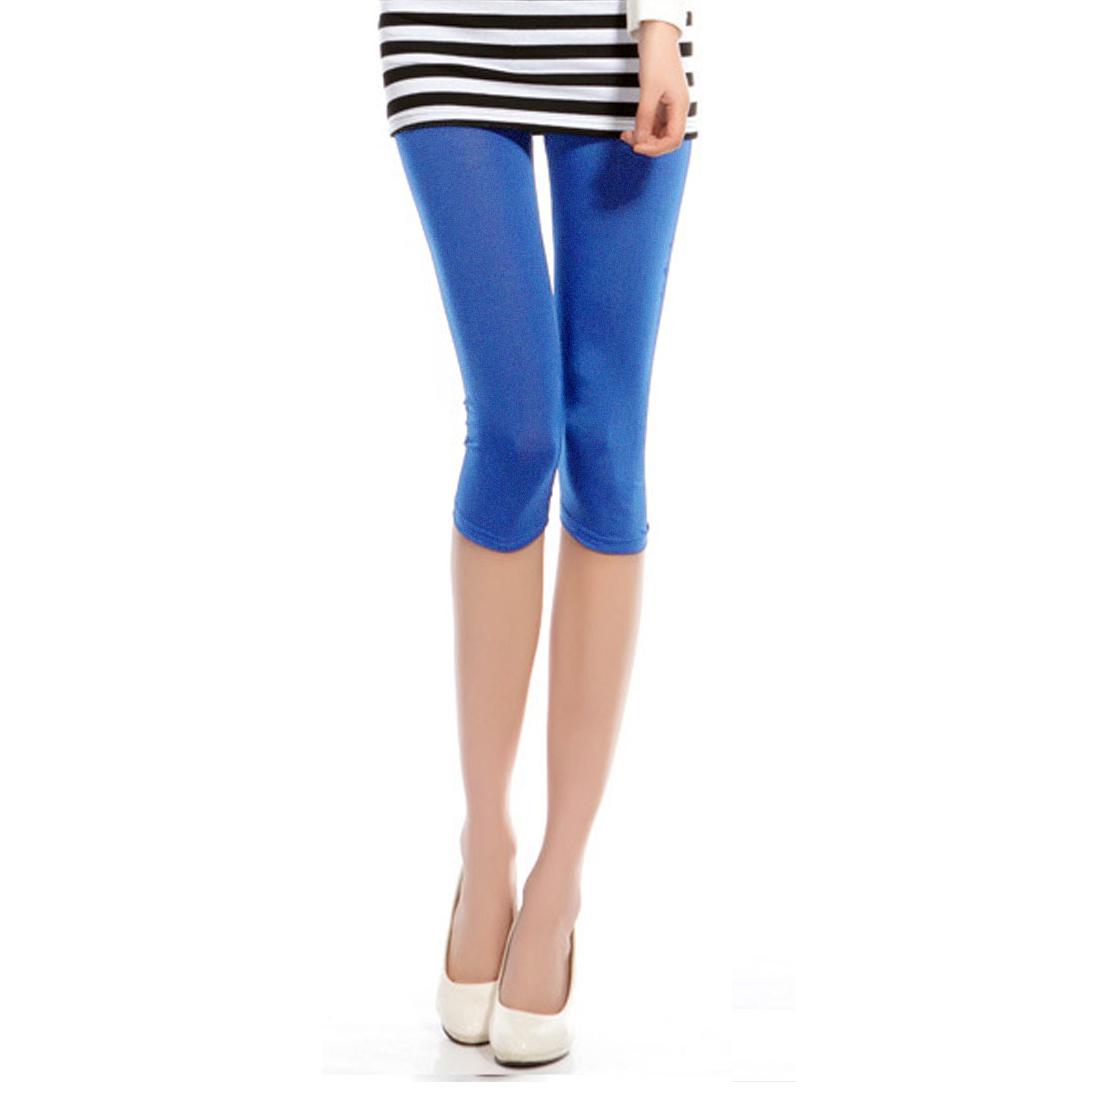 Woman Blue Match Dress 3/4 Leggings Skinny Capris Pants Trousers XS